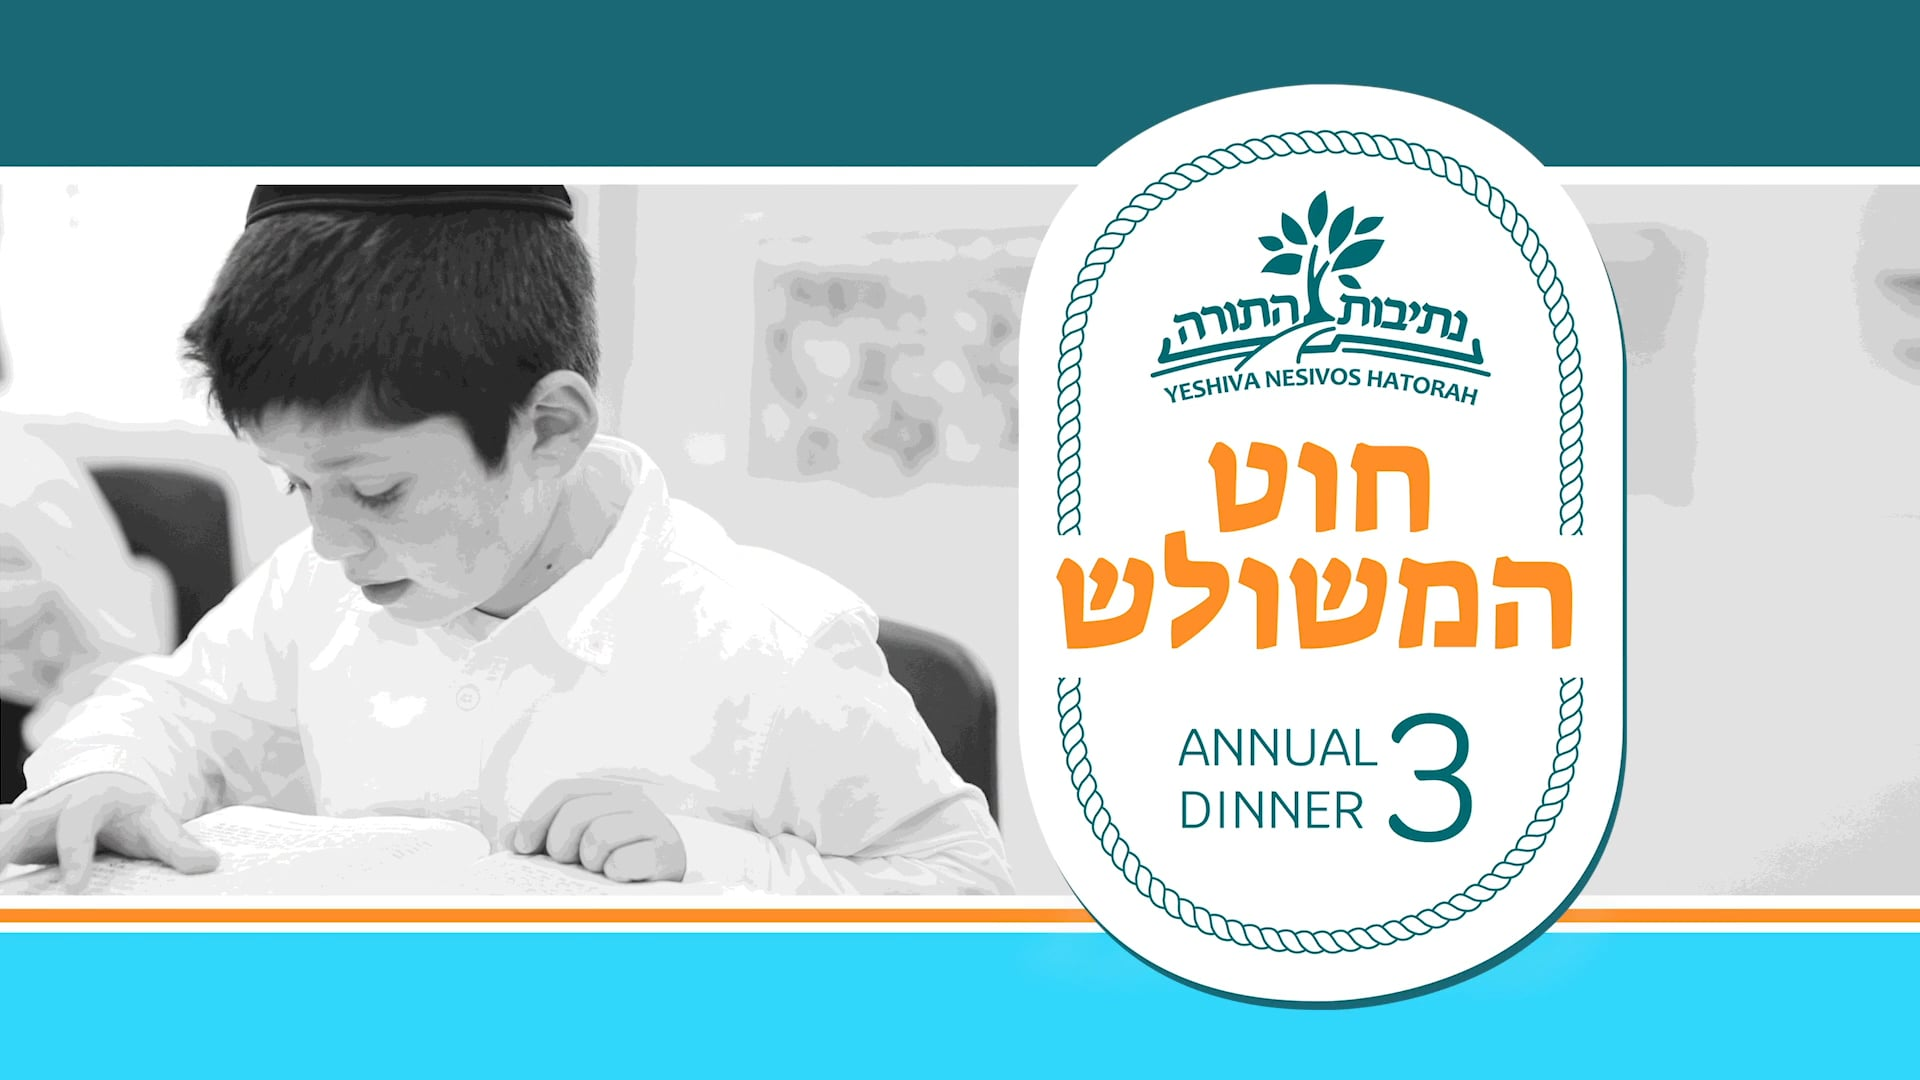 Invitation Video - Yeshiva Nesivos Hatorah 2019 Annual Dinner